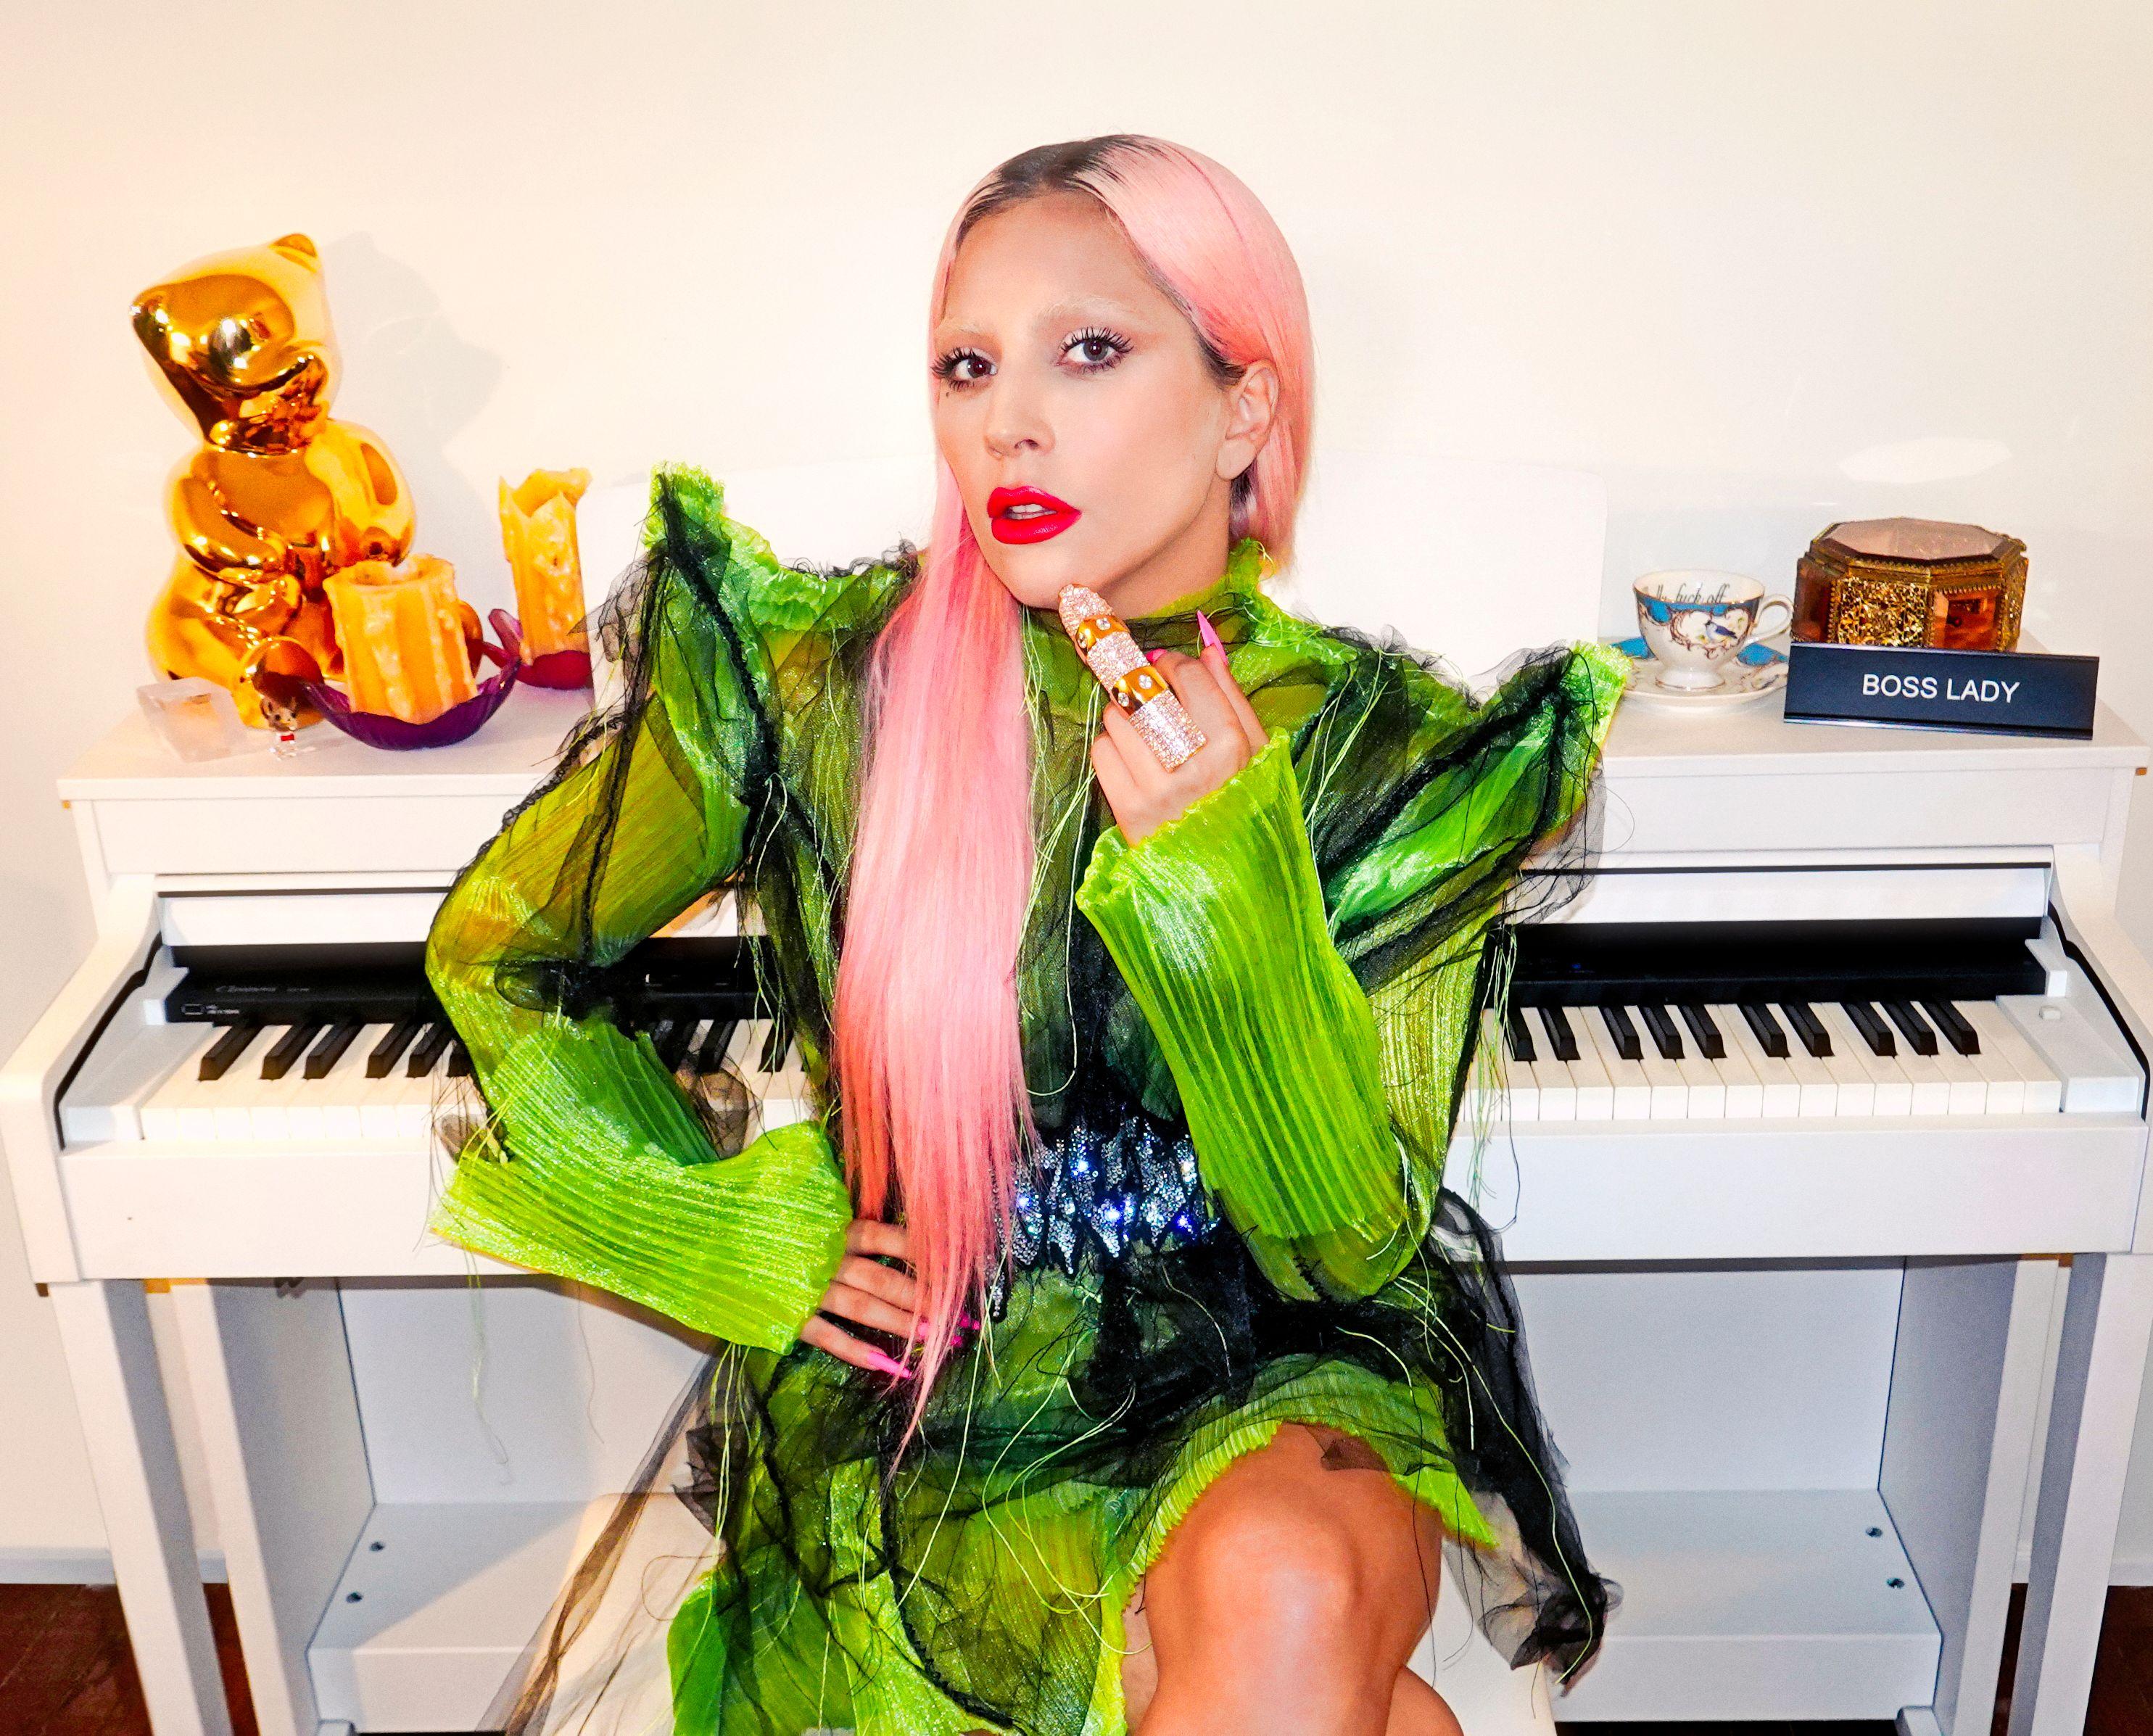 Klarna and Lady Gaga FinTech magazine